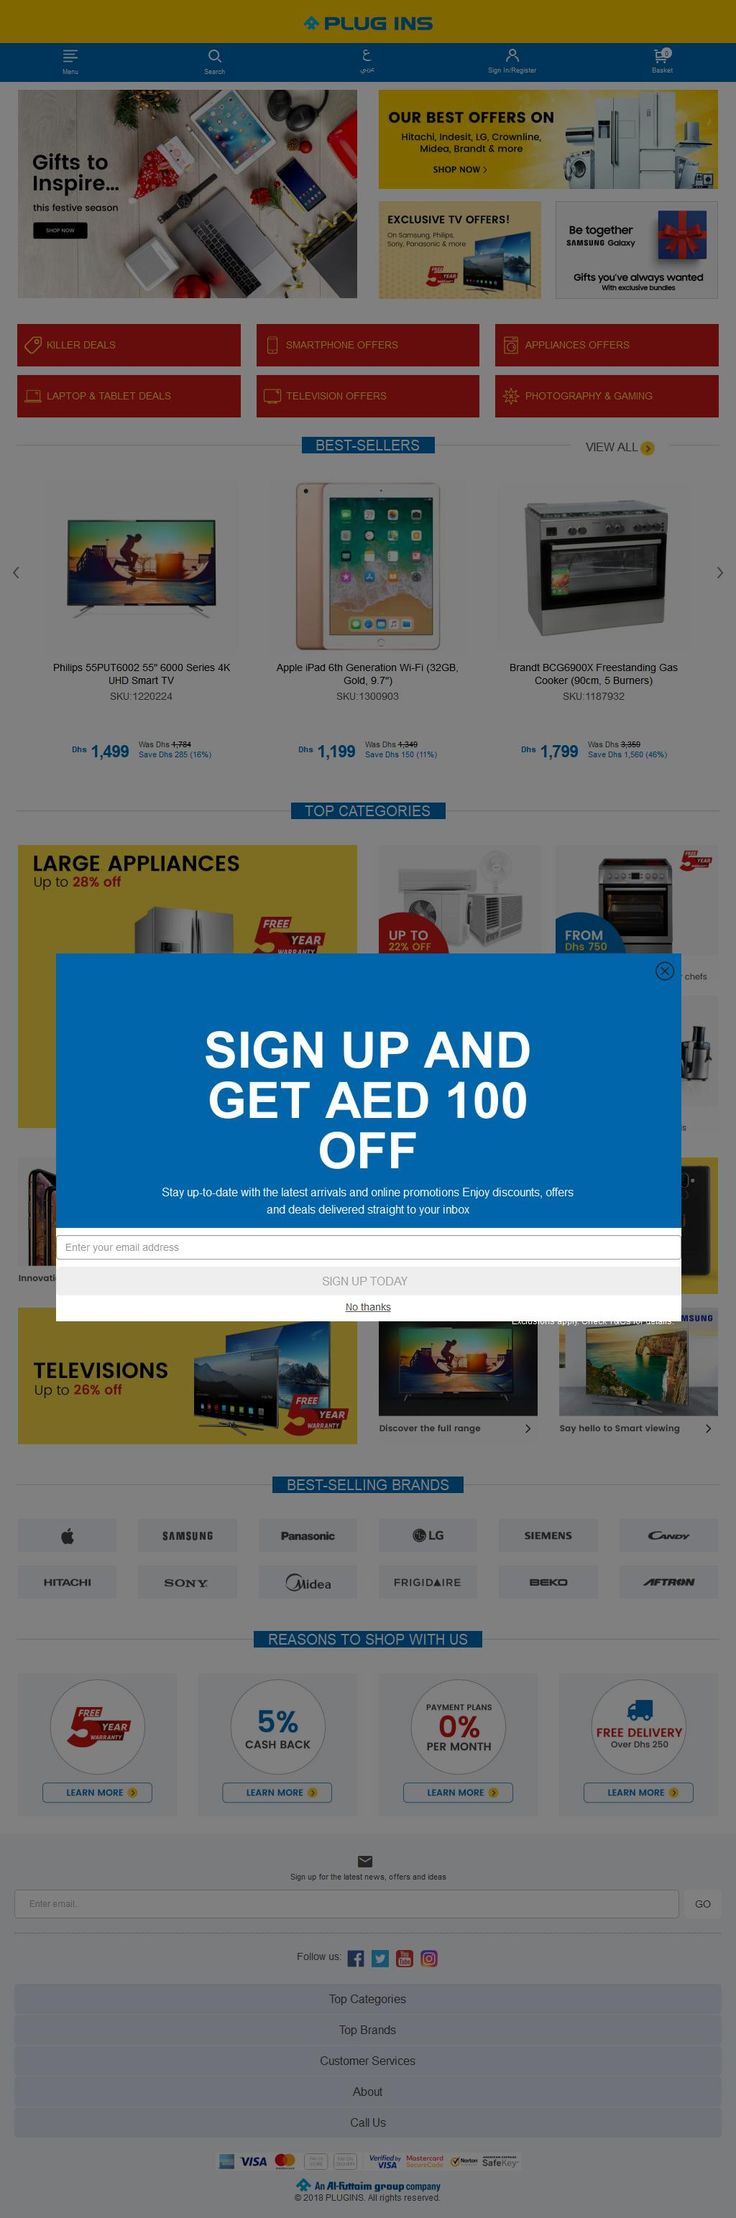 Plug-ins Electronics Shop Deira City Centre, 1b, 30 Street